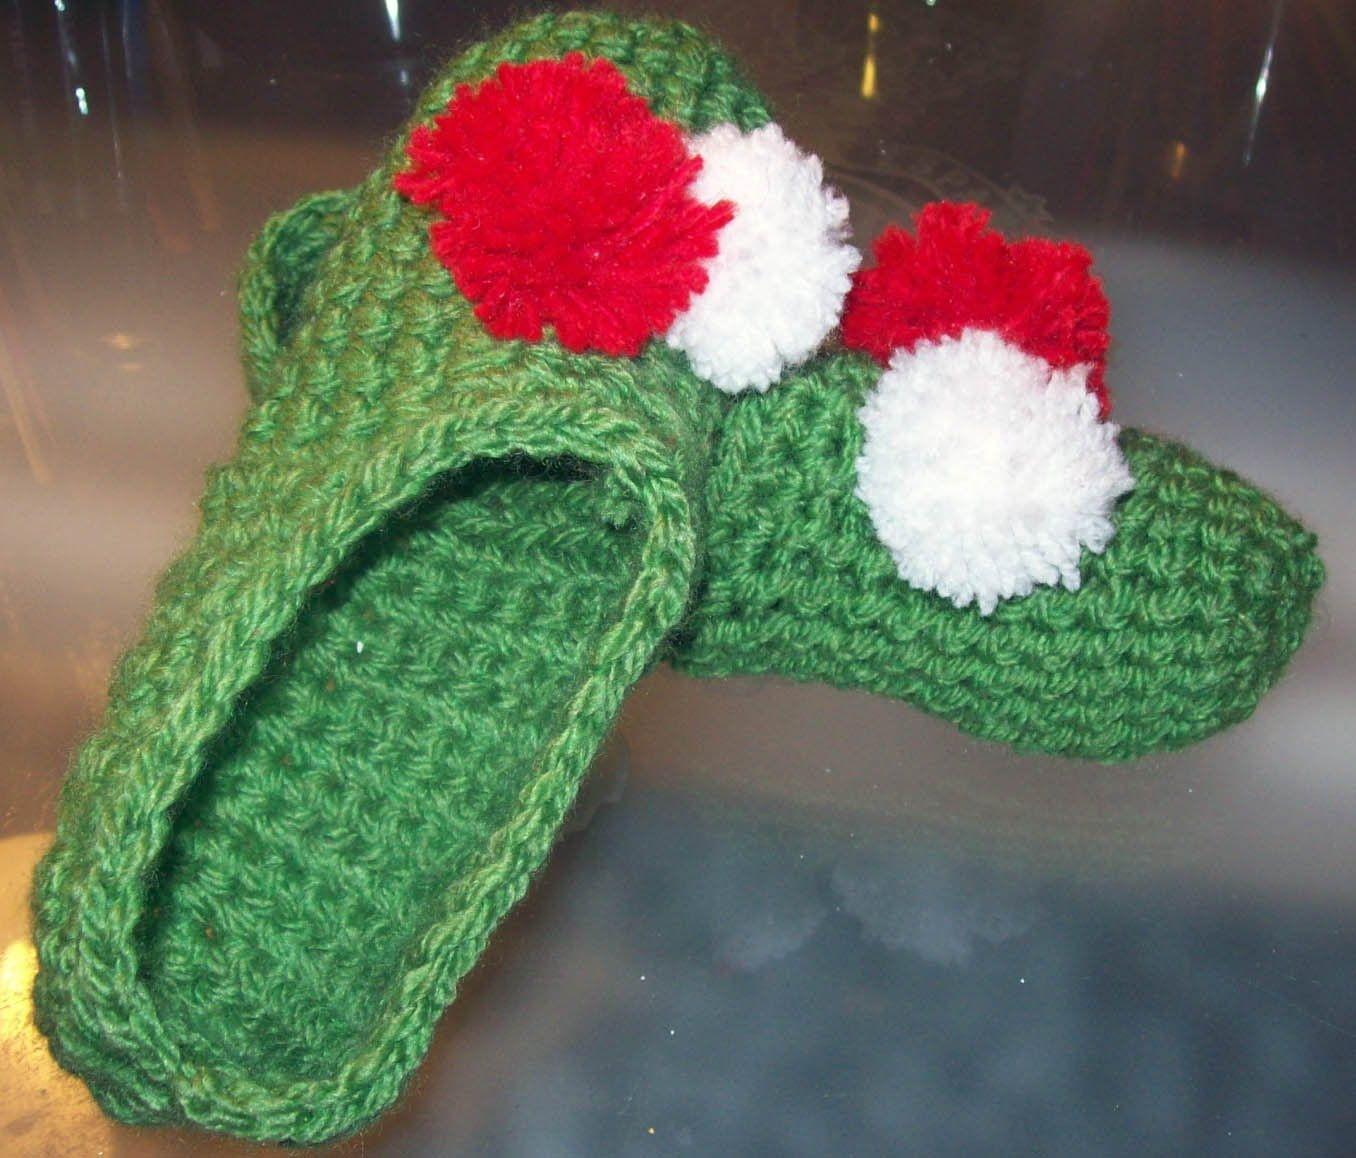 zapatillas crochet a dos colores 2ª parte: TALLERES DE LAS TÉCNICAS DE L...